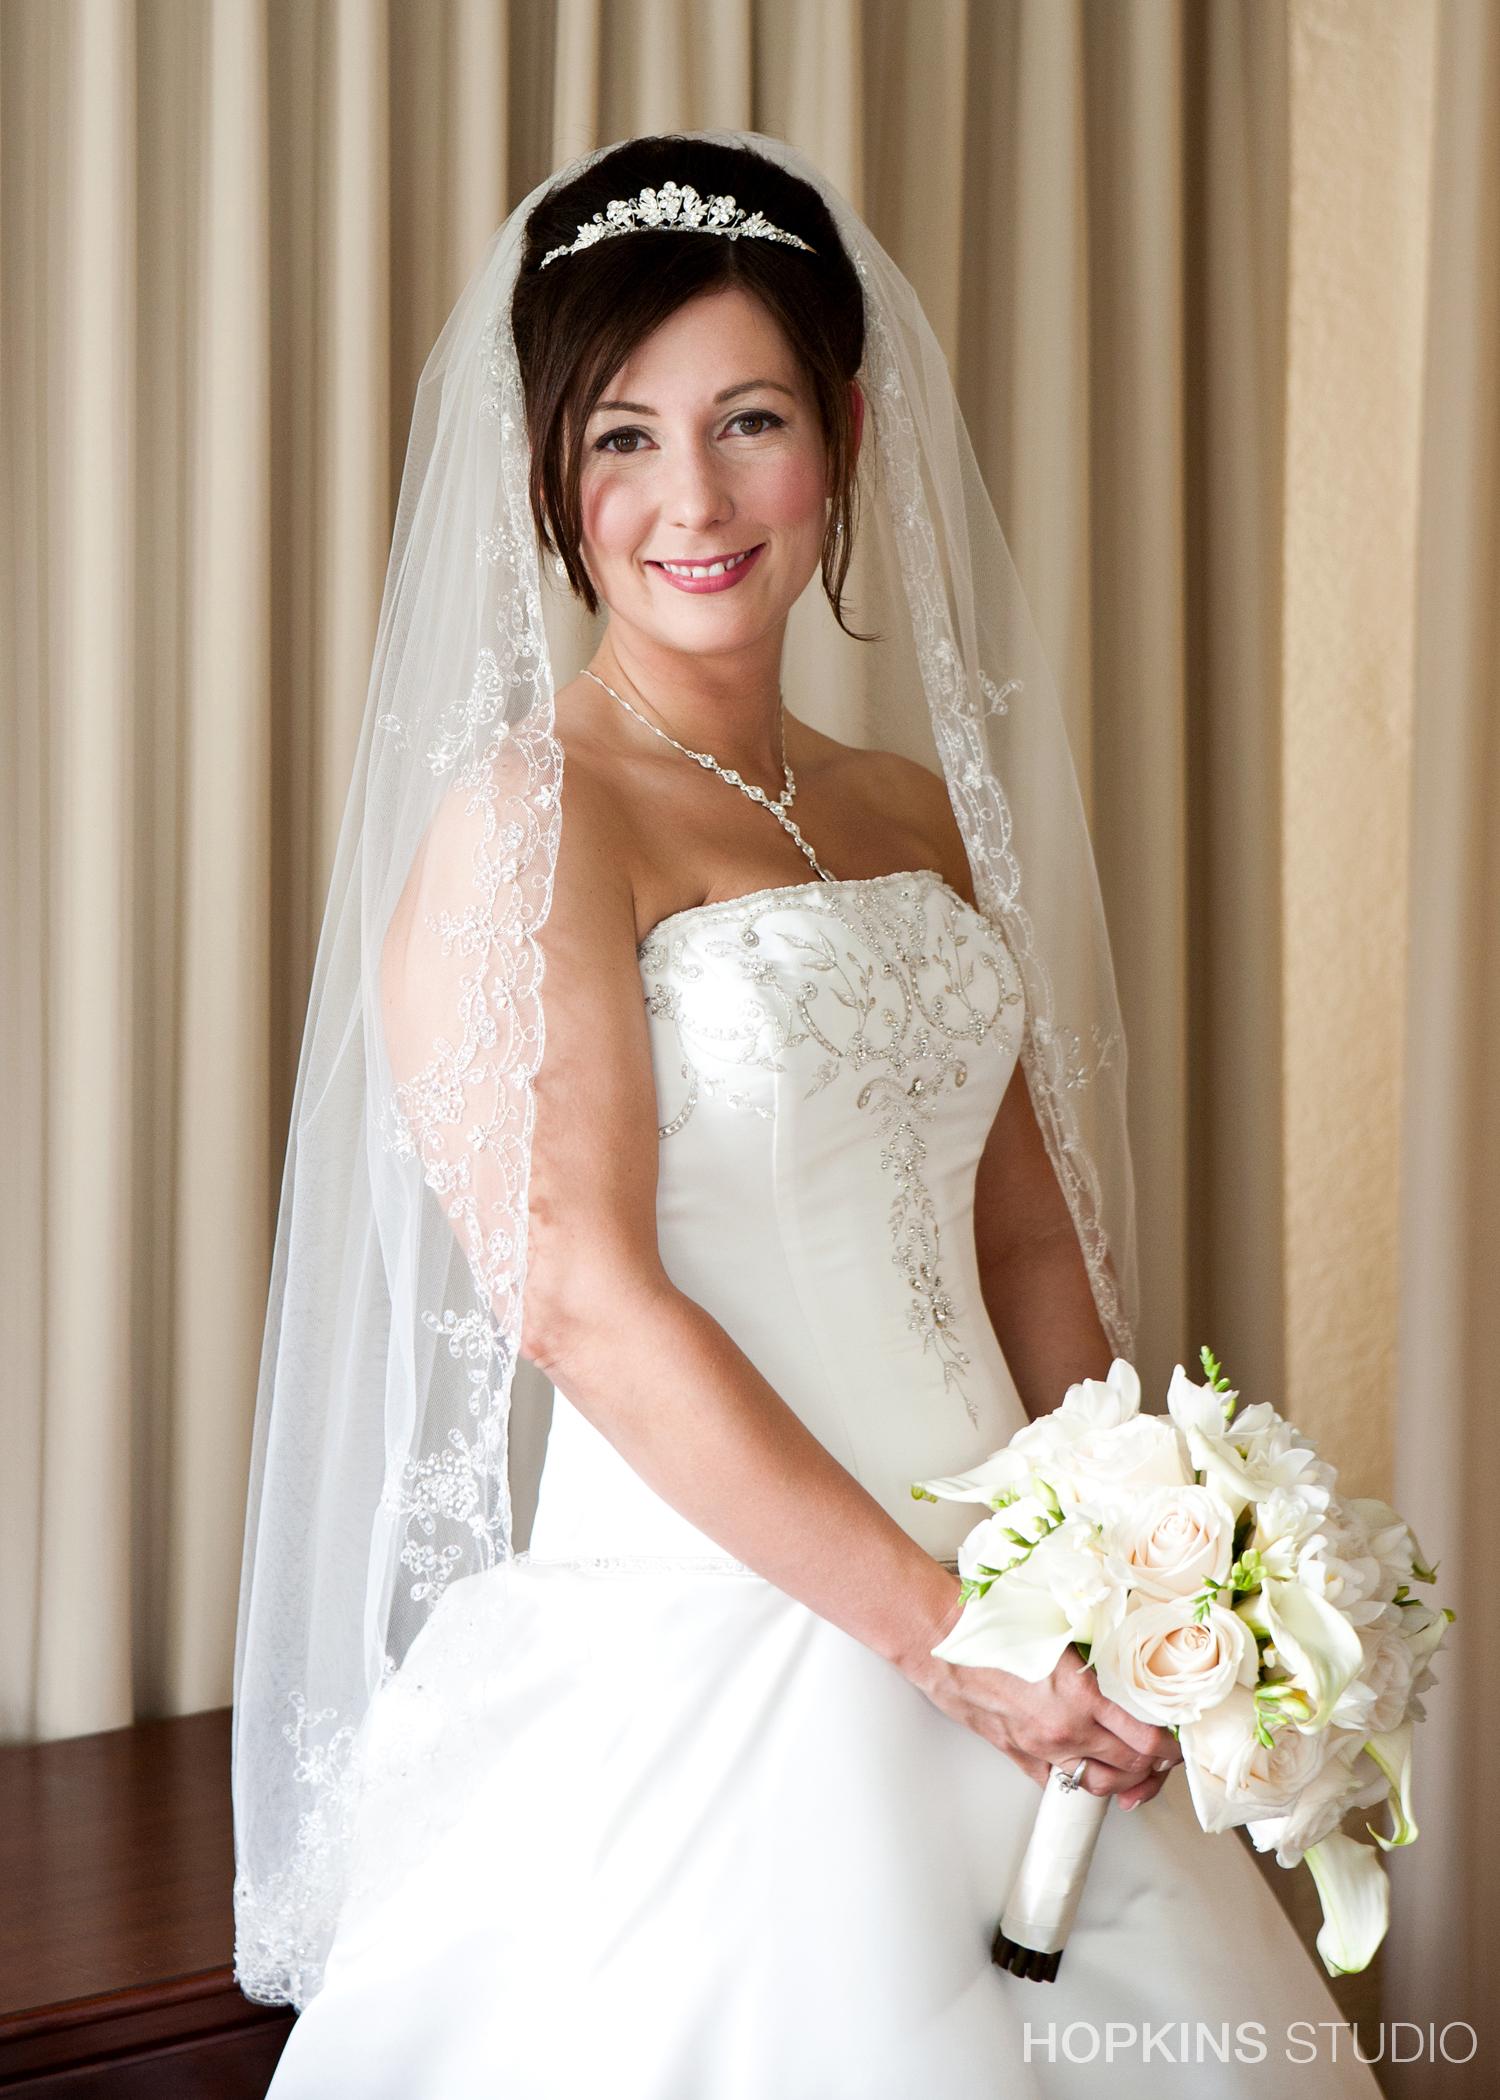 wedding-photography-Windsor-Park-Conference-Center-South-Bend-Indiana_14.jpg